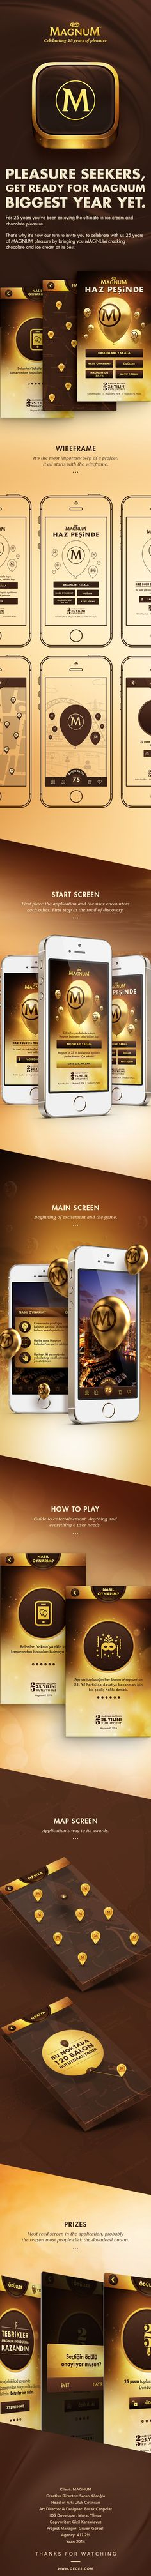 Celebrating 25 Years of MAGNUM Pleasure App on Behance